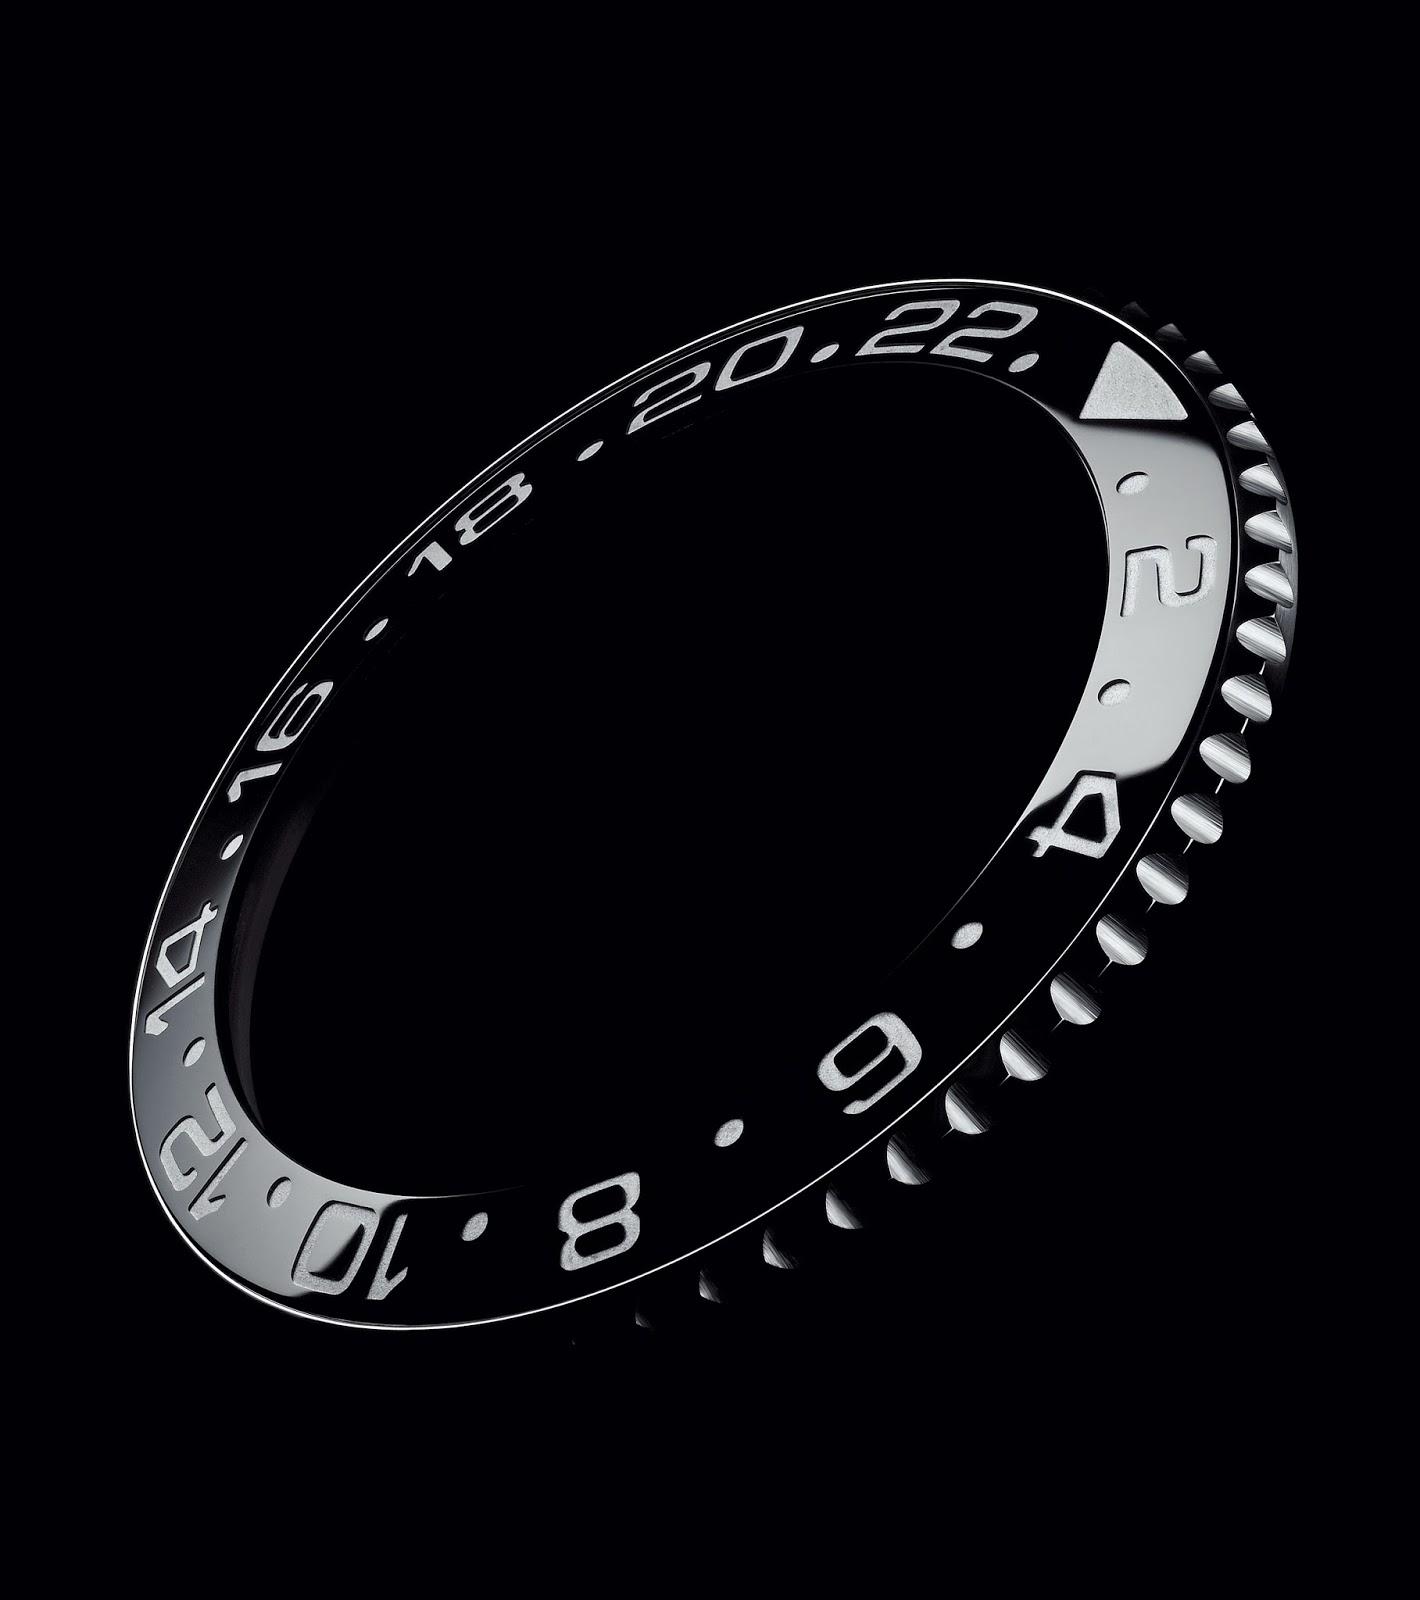 драйвер для навигатора prestigio geovision 5500